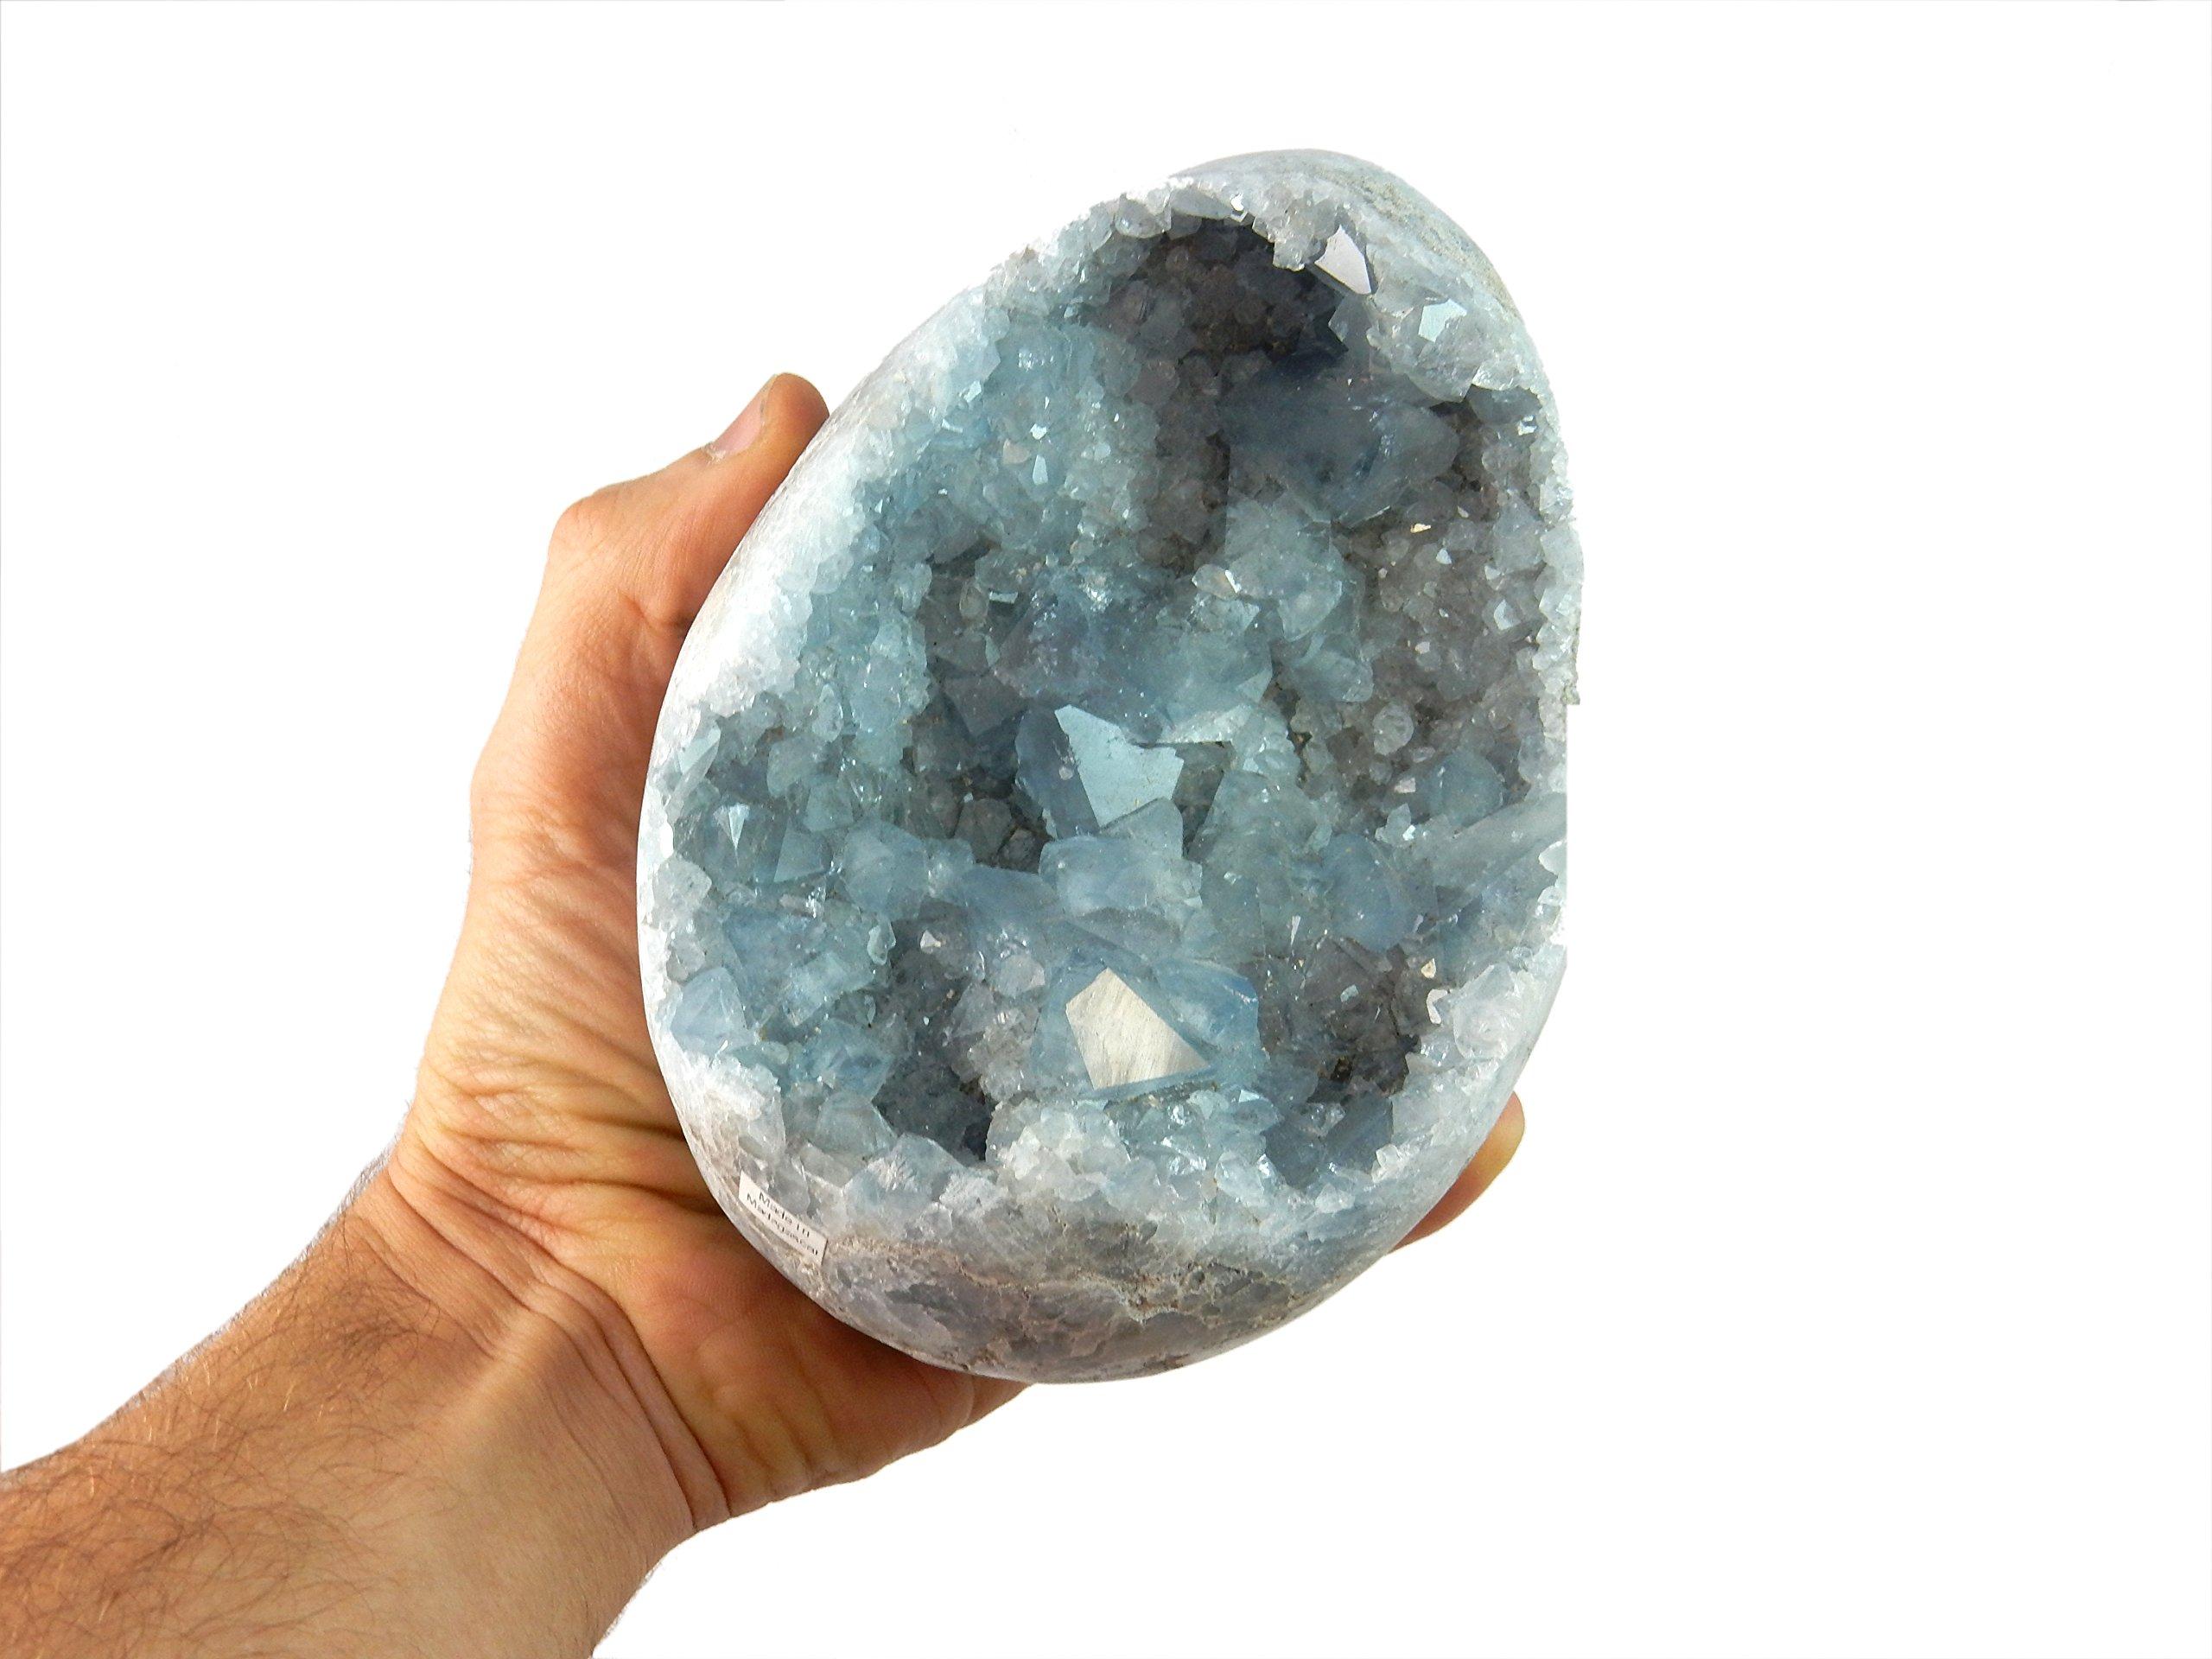 Beverly Oaks Blue Celestite Crystal ~ Celestite Stone for Meditation, Reiki and Crystal Healing